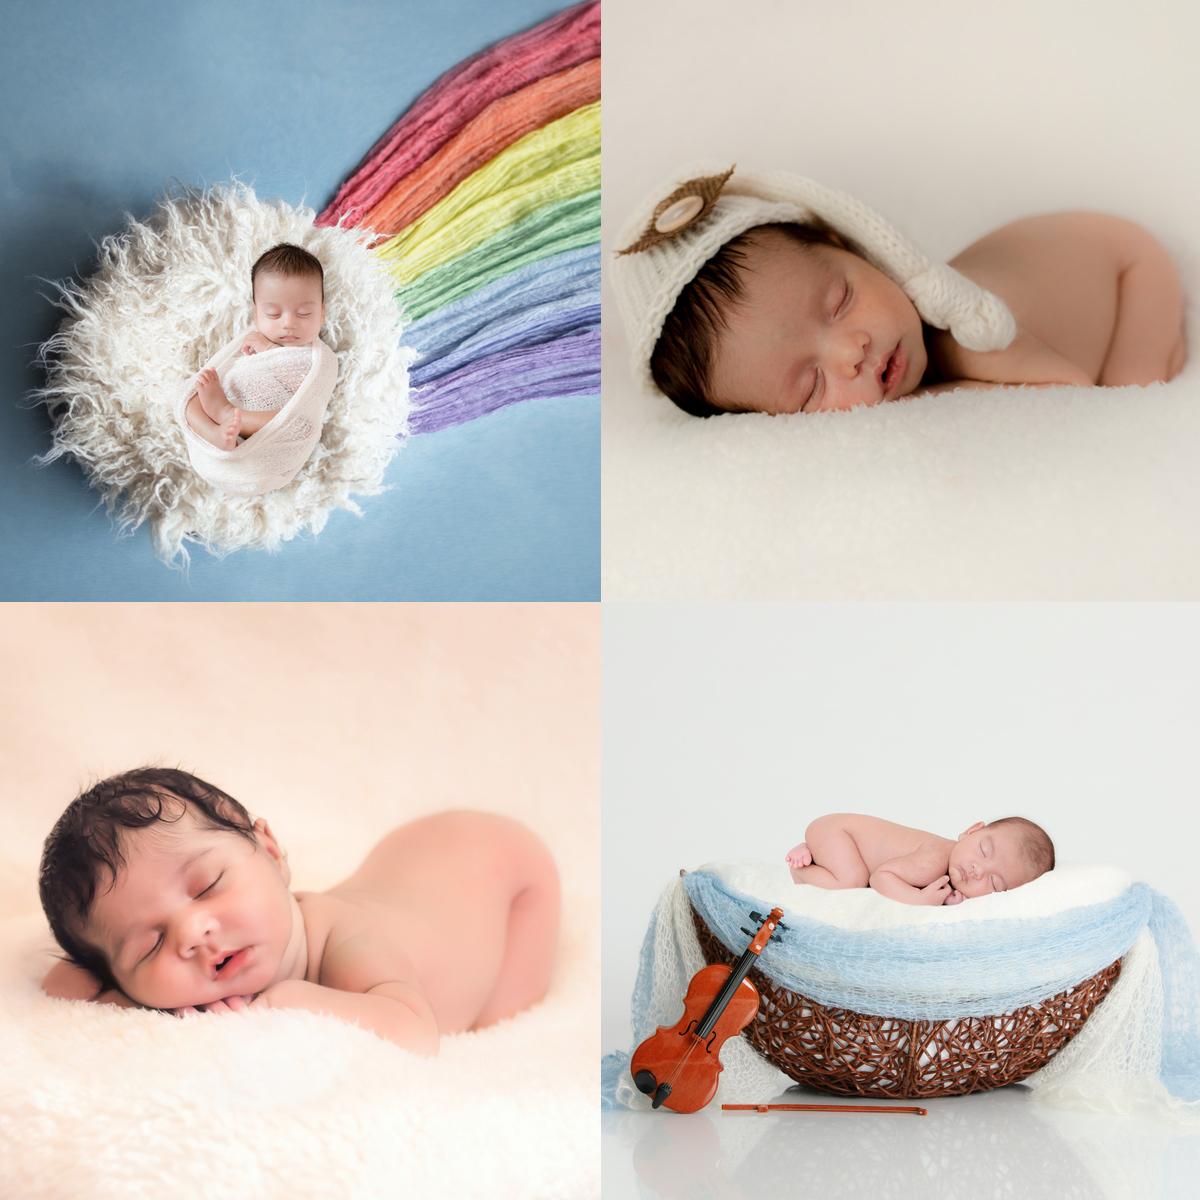 Newborn Photography 1 ❤ NiddledyNoddledy.com ~ Bumps to Babies Photography, Kolkata.jpg